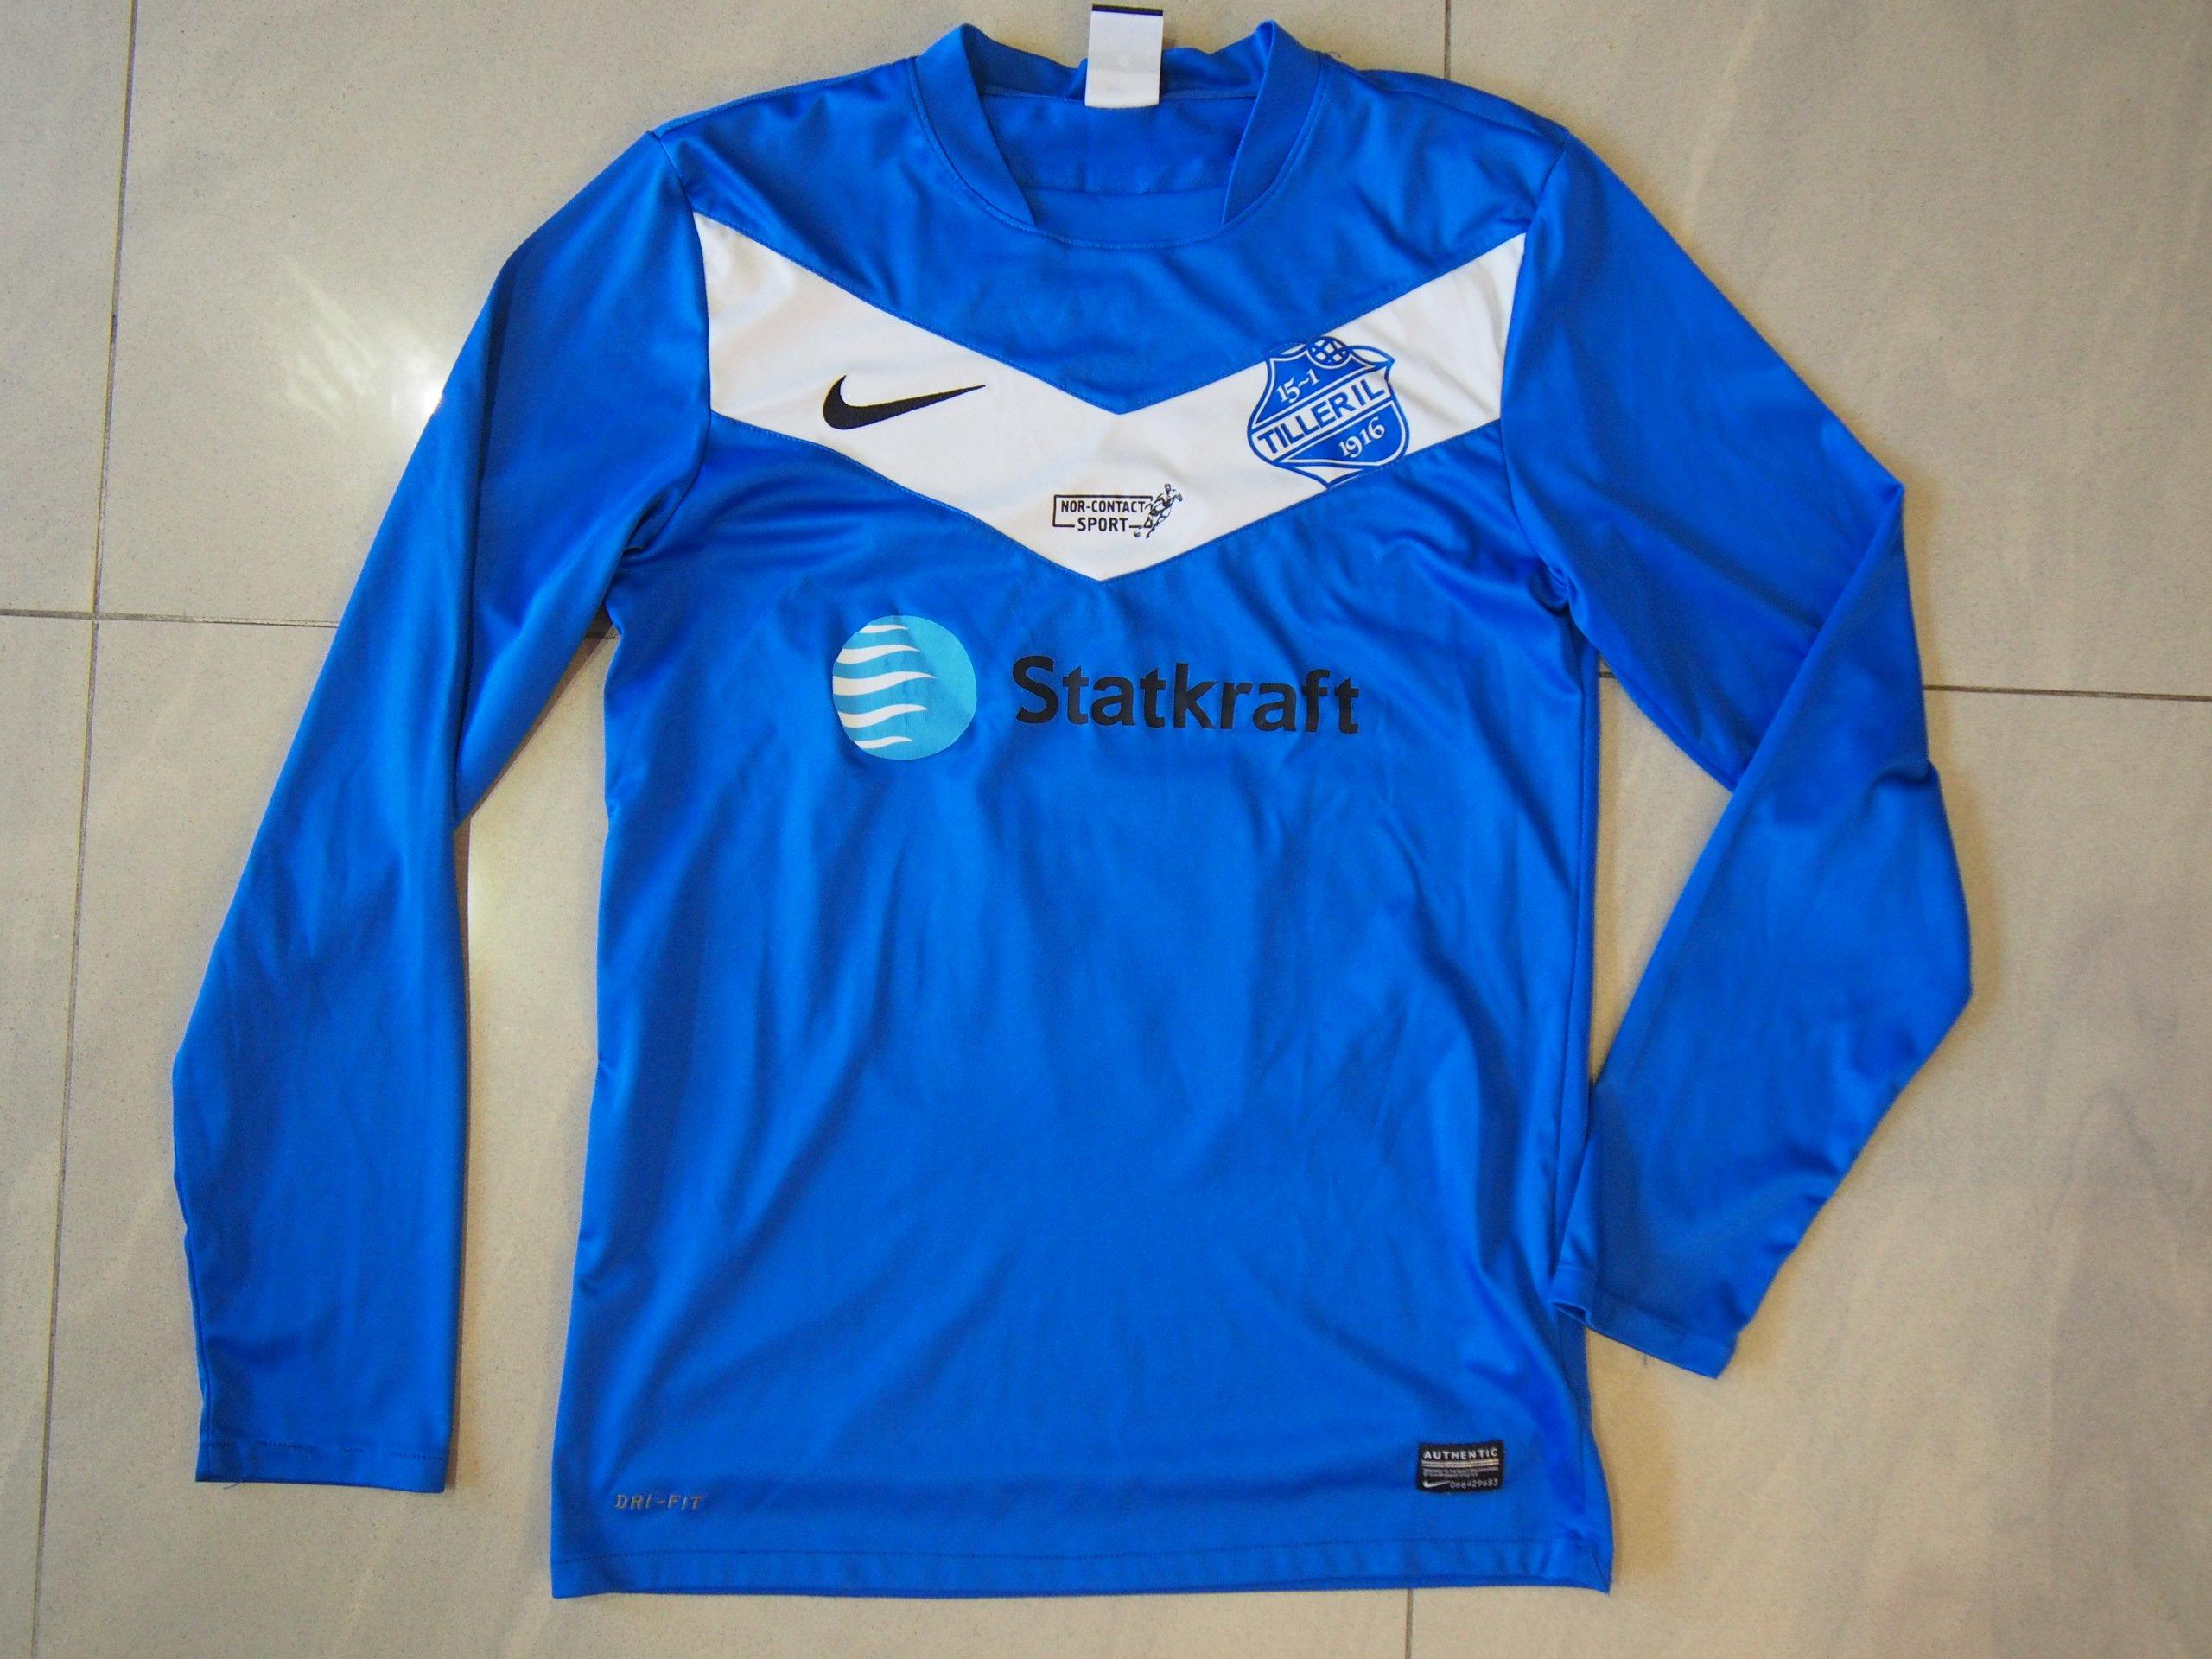 Nike koszula bluza sportowa męska S Dri-Fit